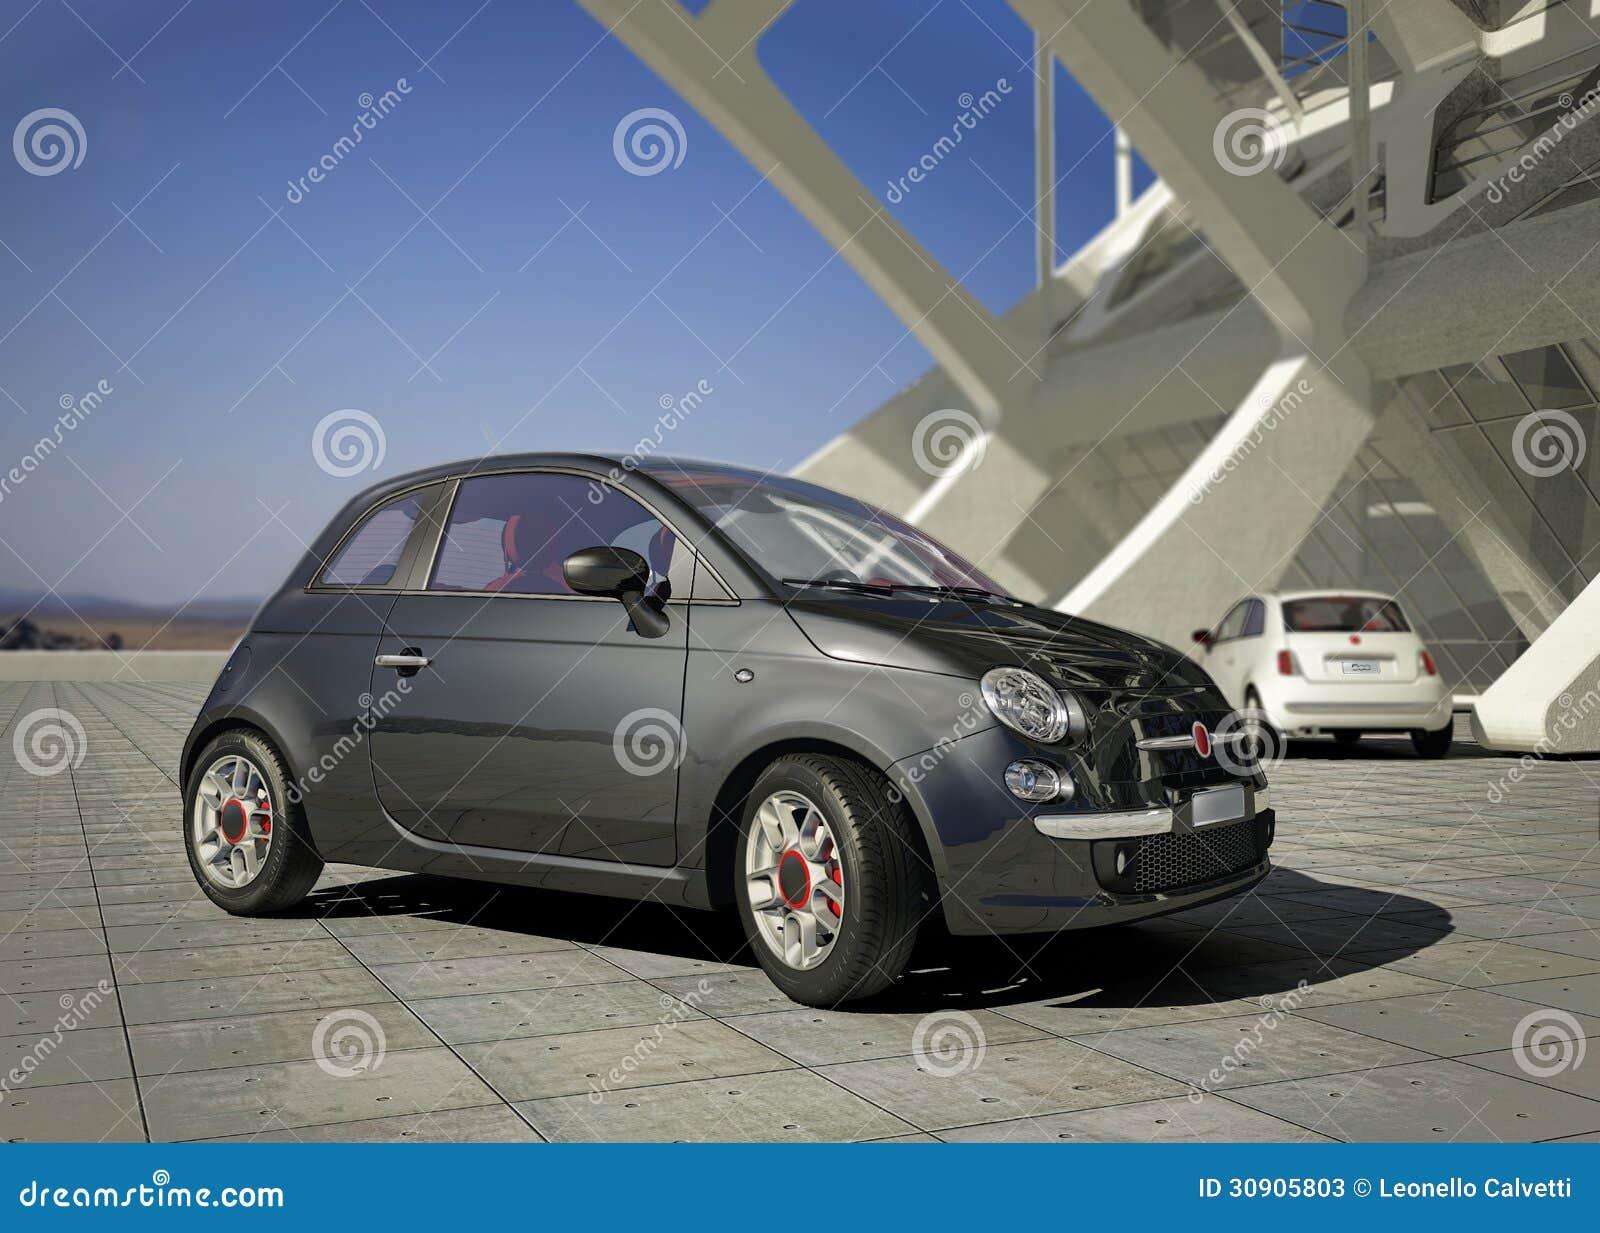 Fiat 500 stadsauto, buiten modern de industriële bouw milieu.